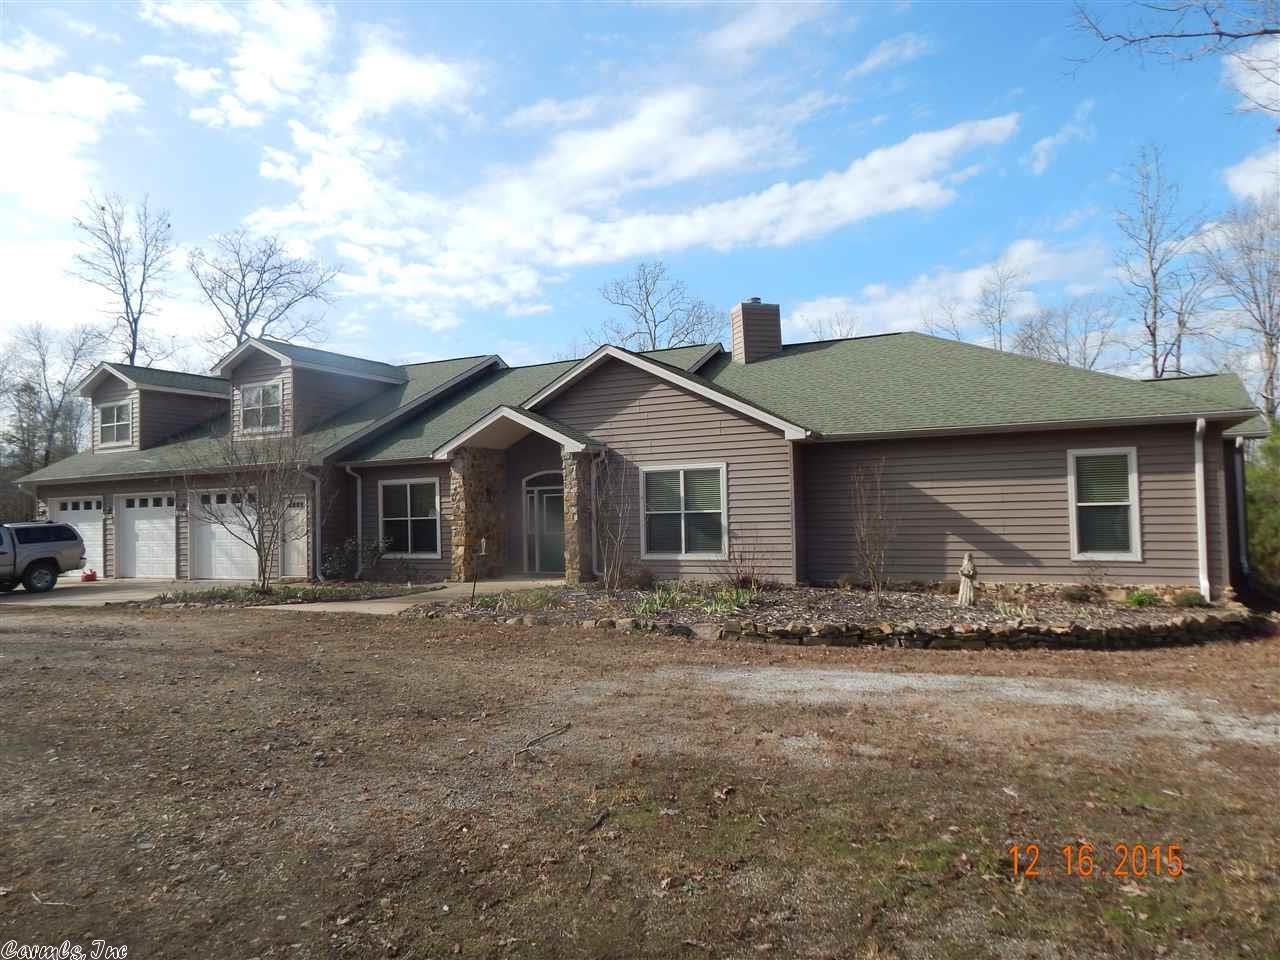 102 Winding Woods Trl, Bonnerdale, AR